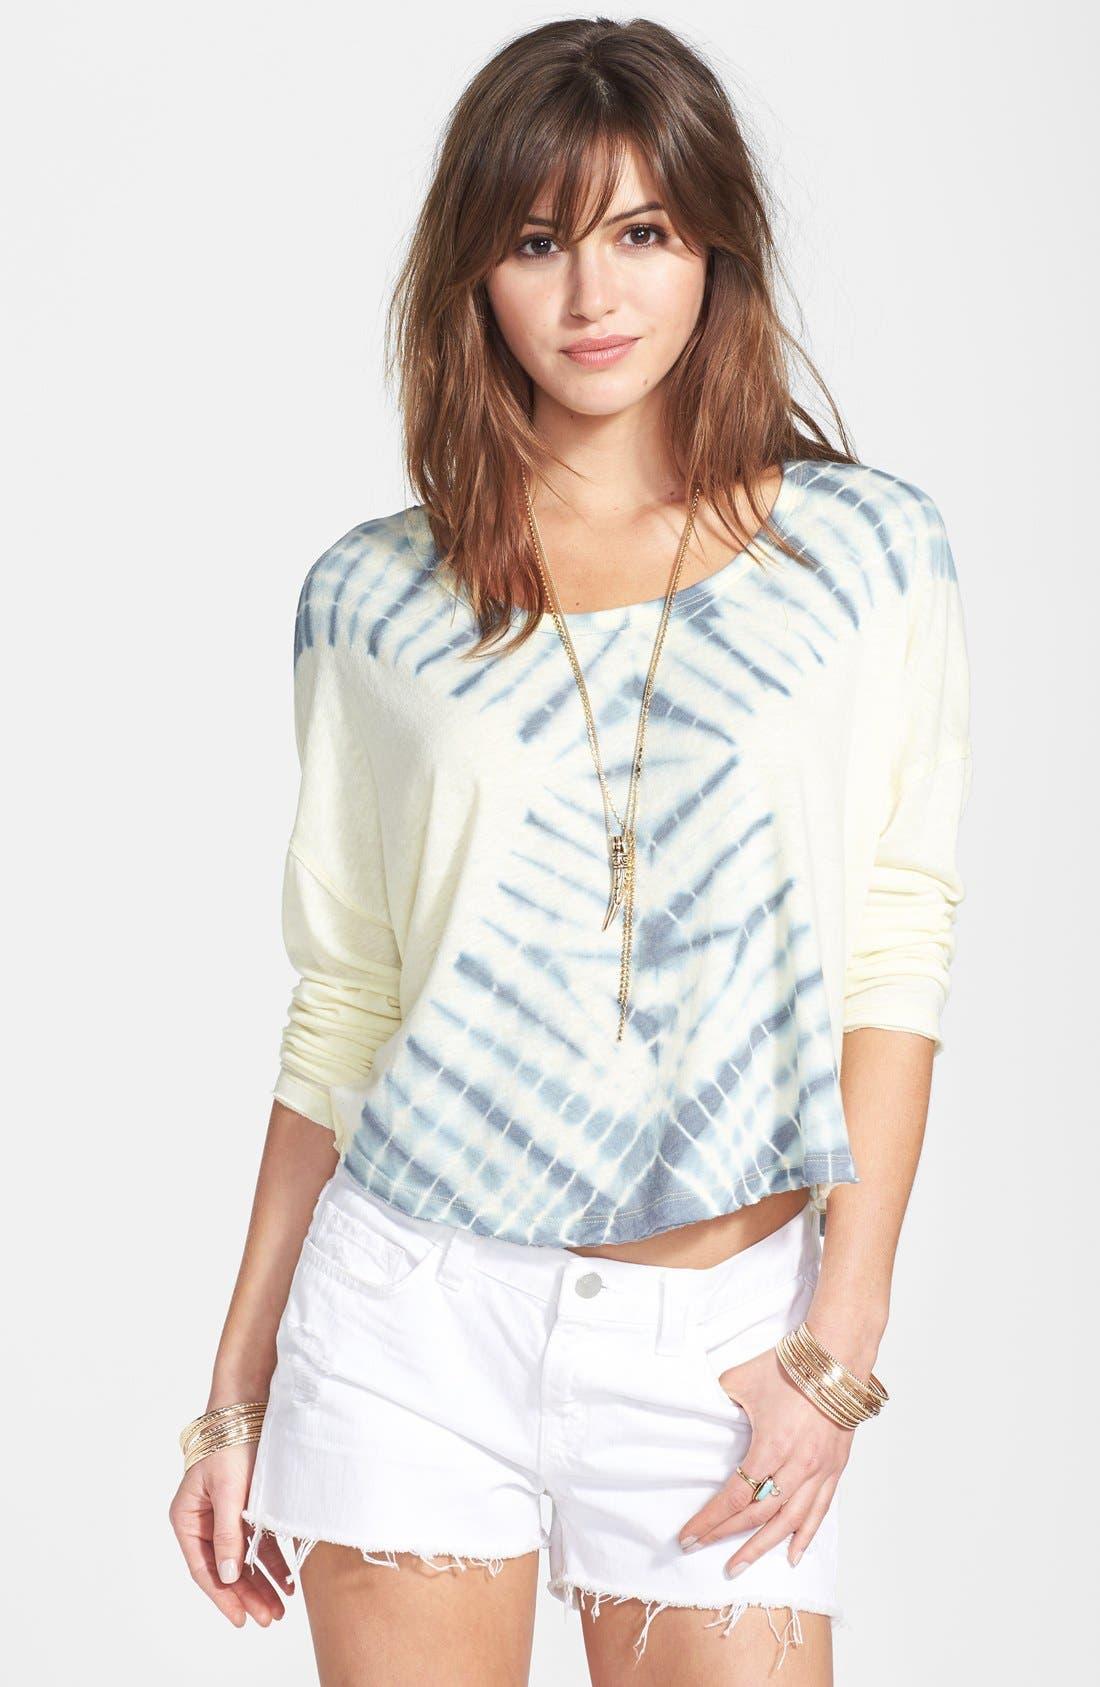 Main Image - Free People 'Sundown' Tie Dye Cotton Blend Top